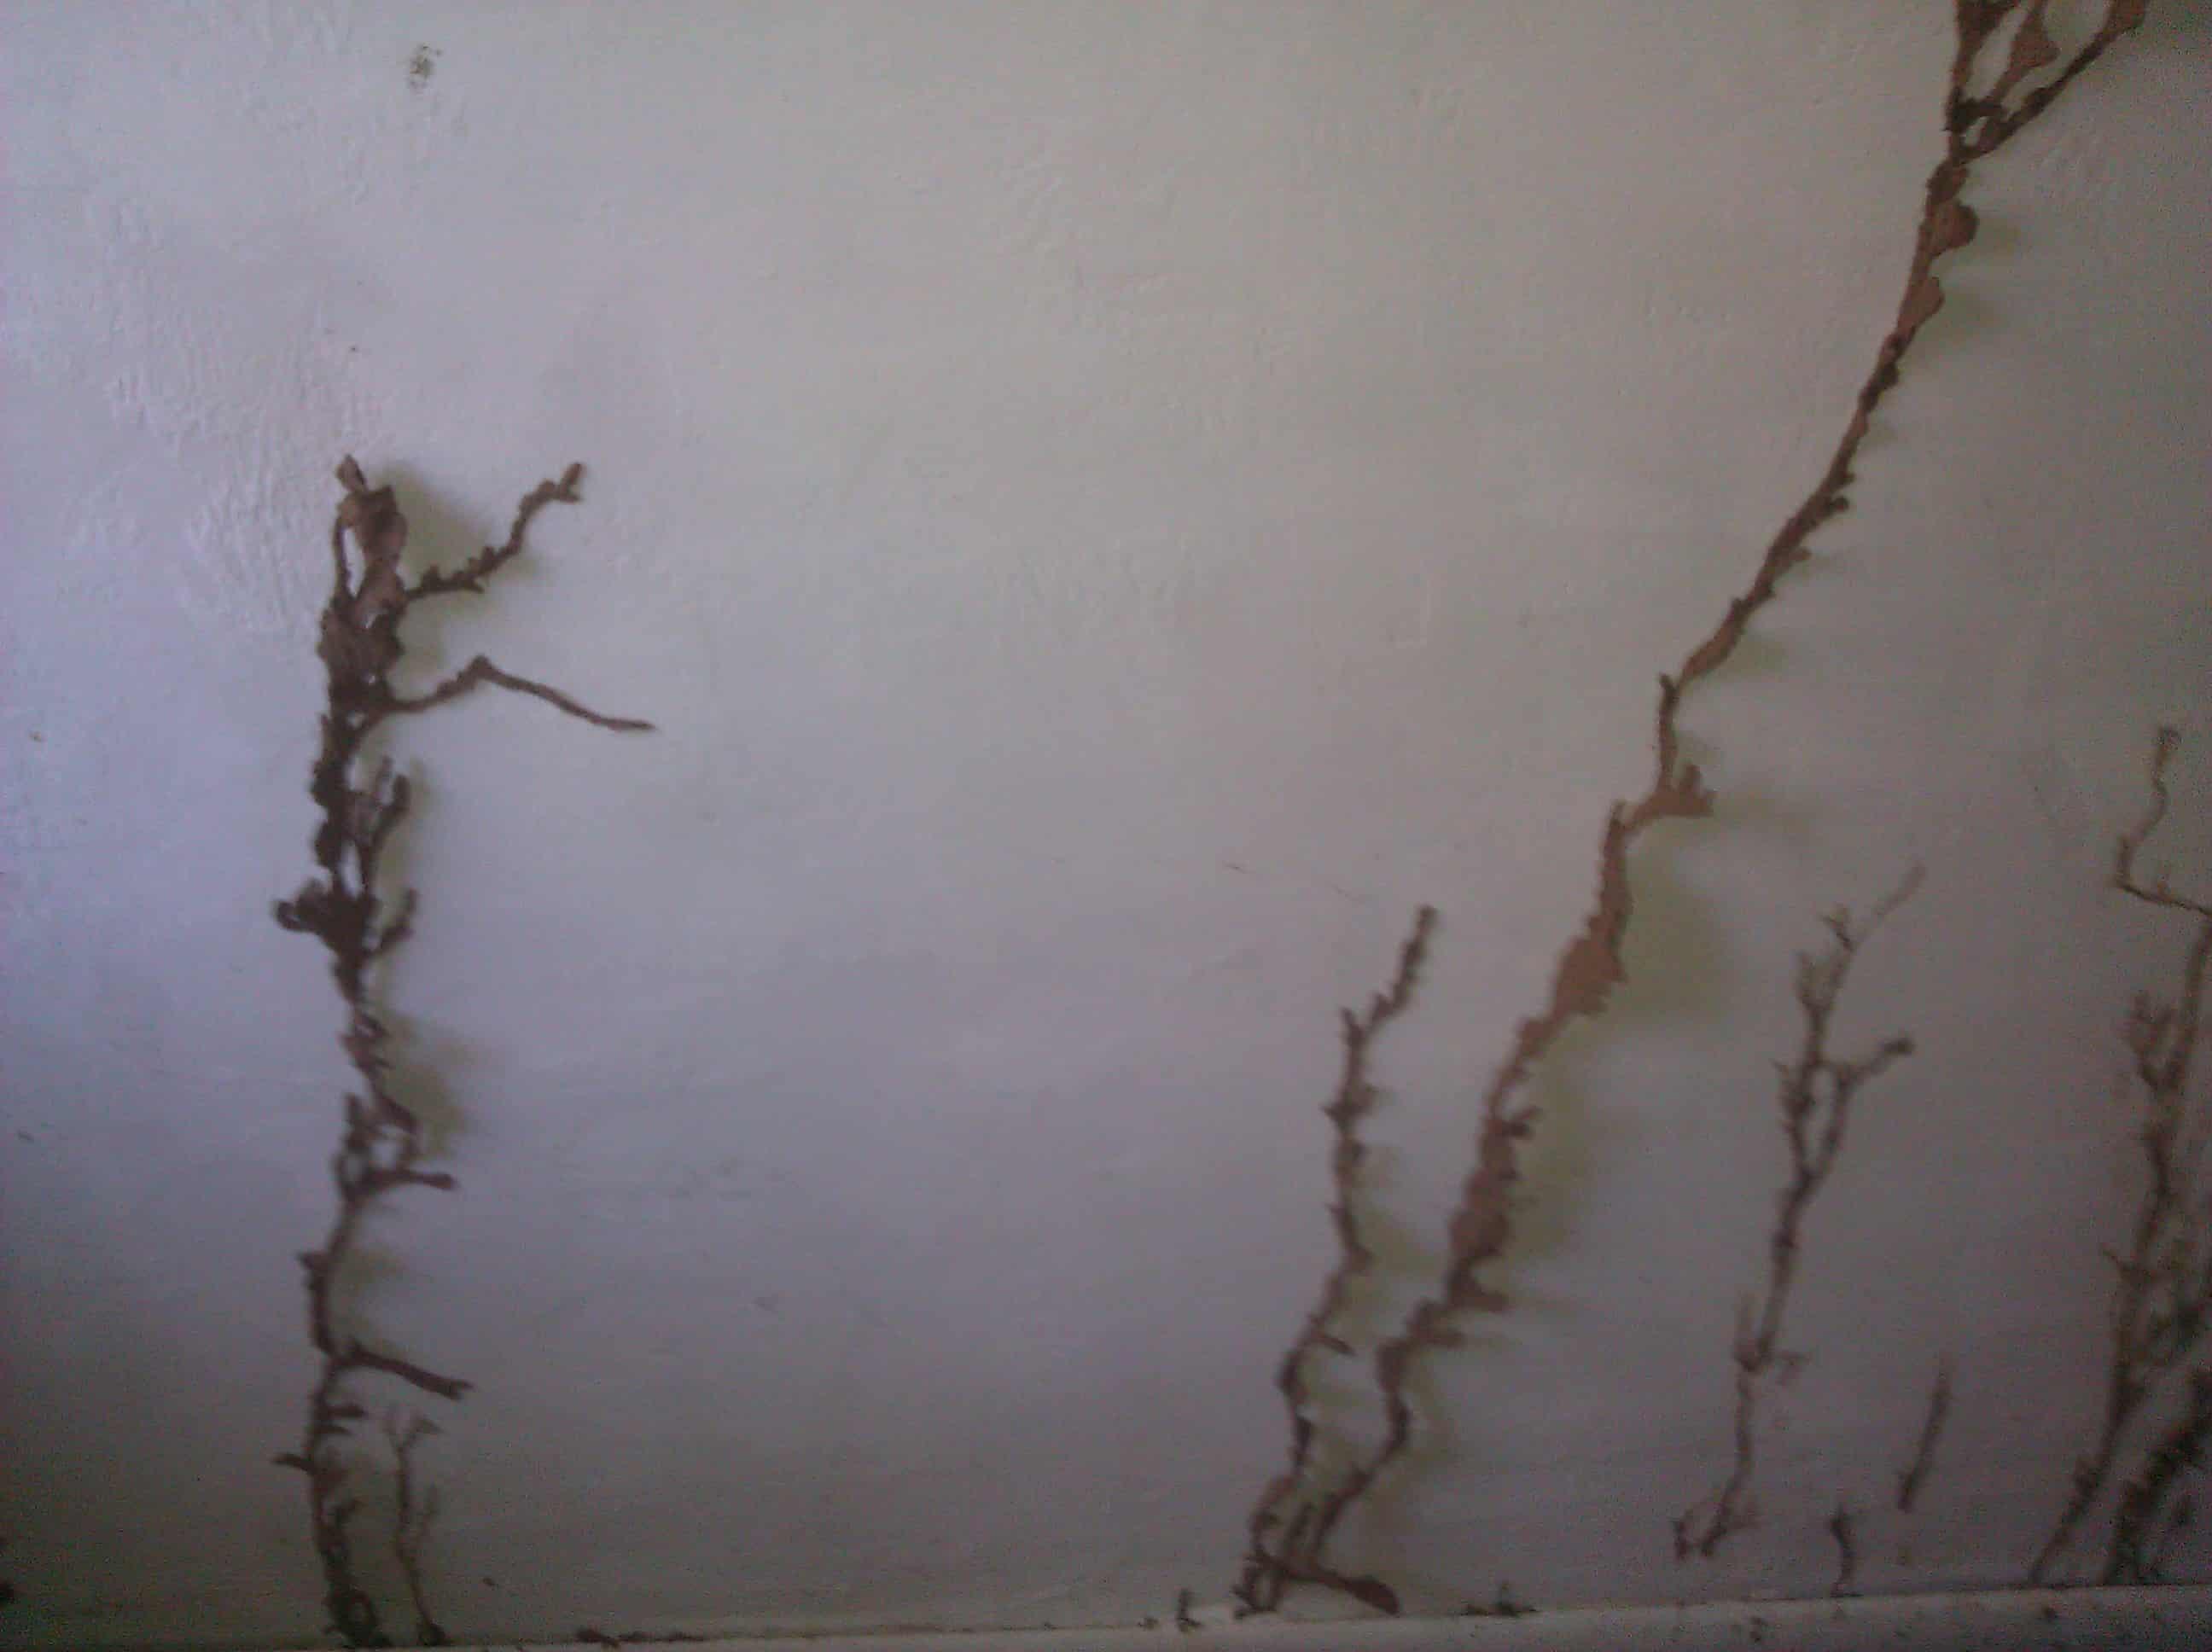 Termite tubes